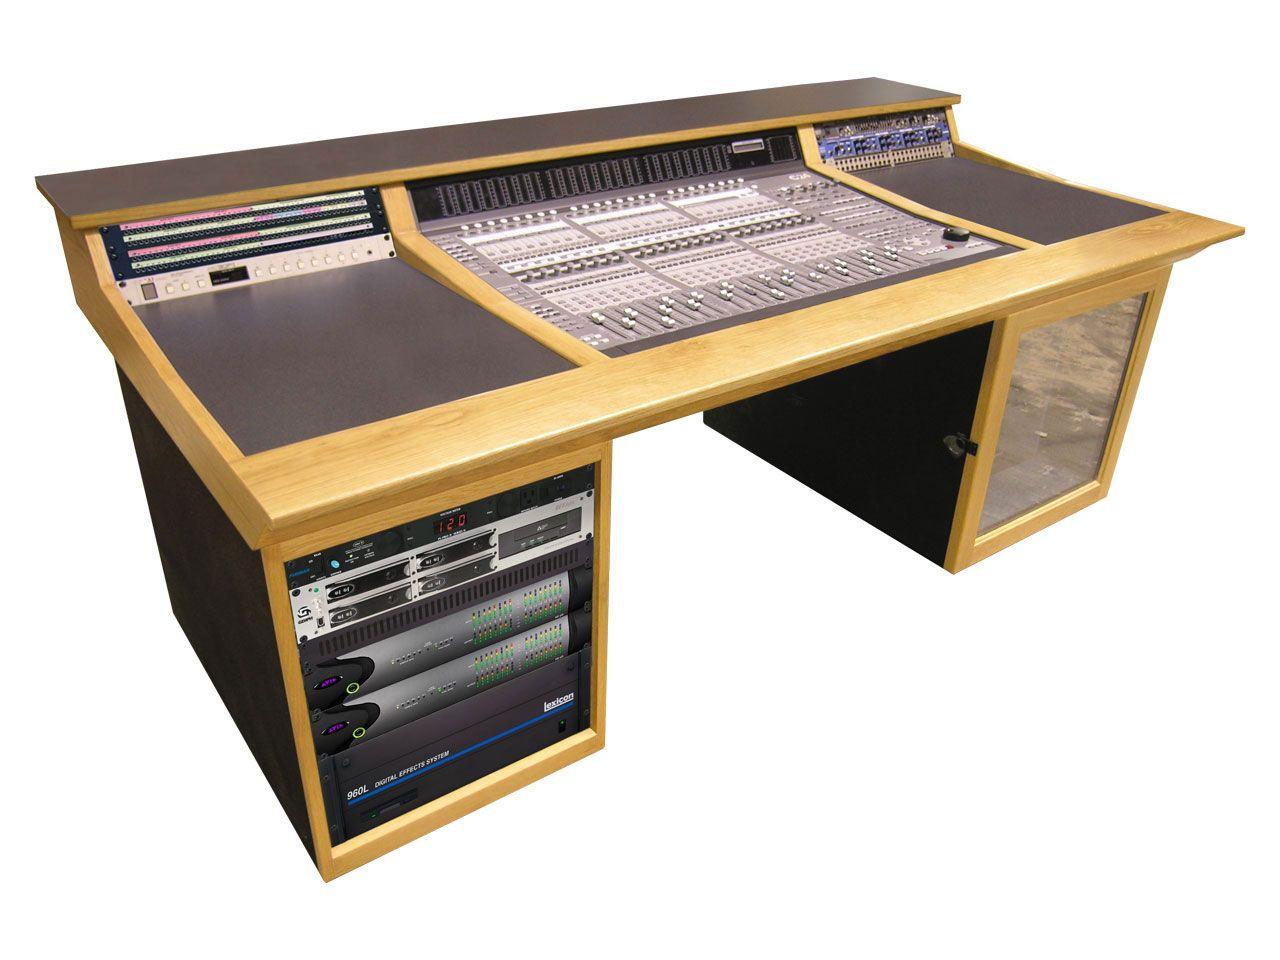 Supply C 24s1 2 Straight Console 1 Desk For Avid C24 Full Comp